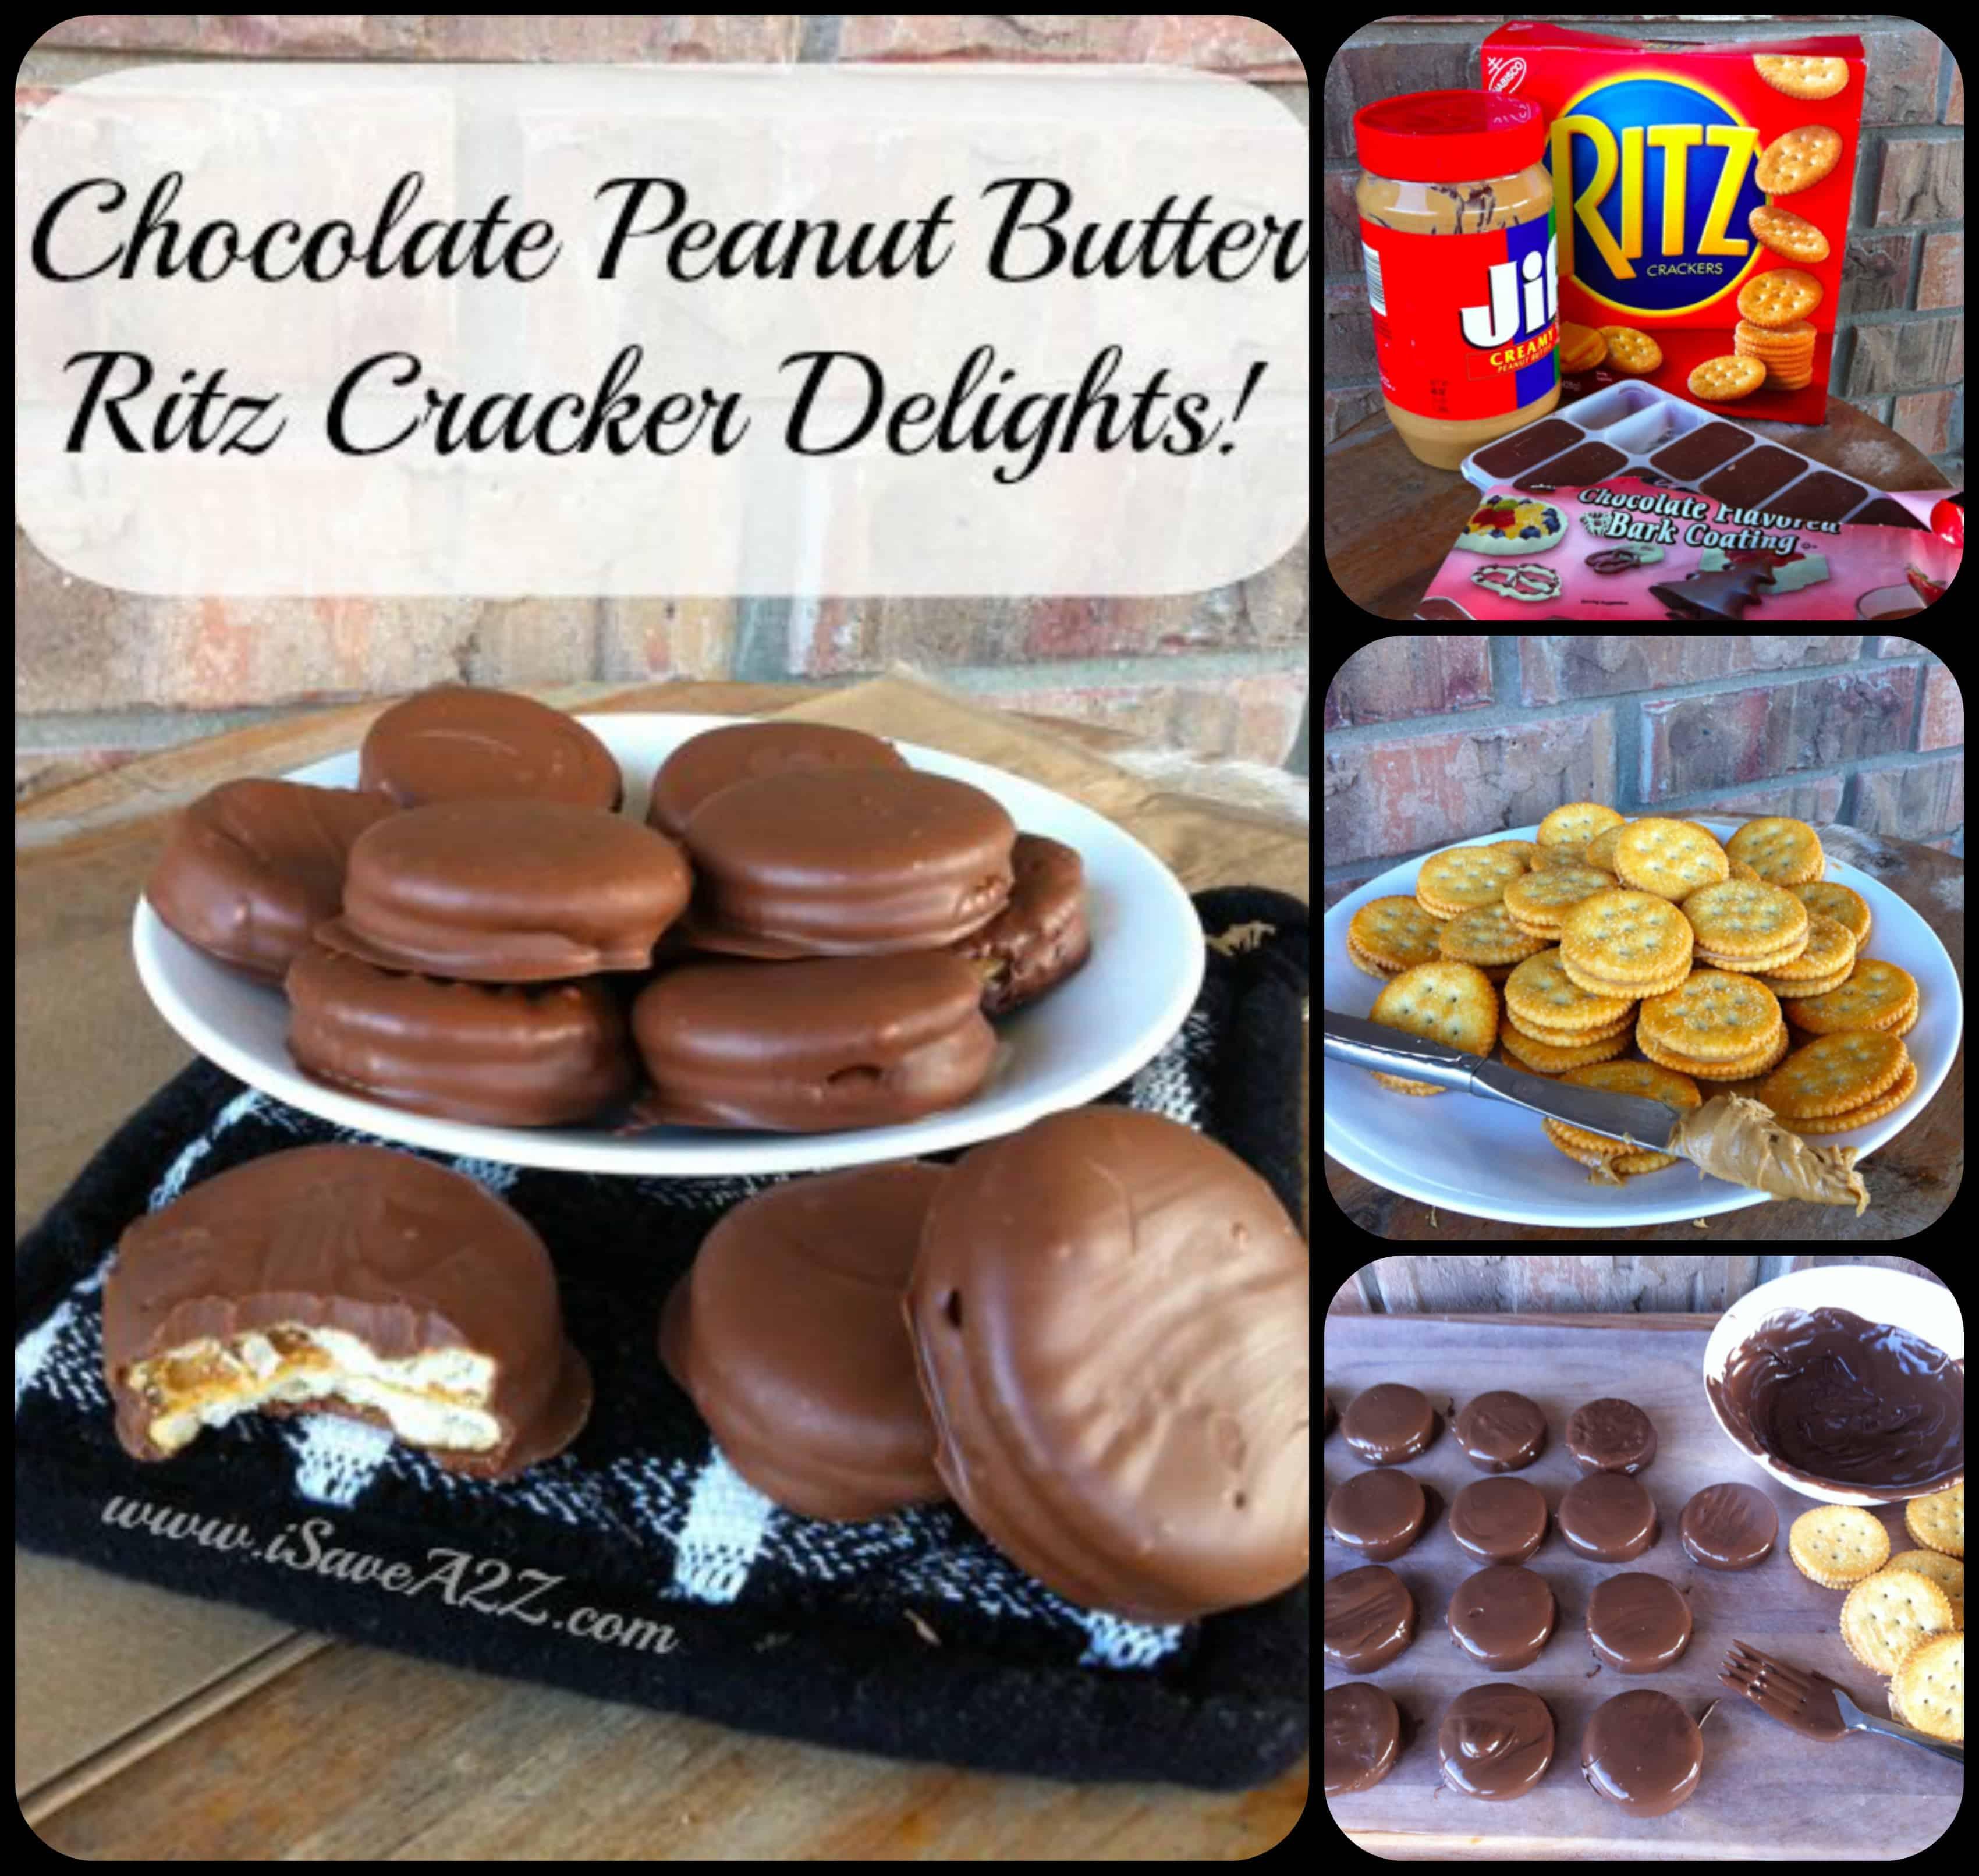 Ritz Cracker Peanut Butter Chocolate Dipped Cookies